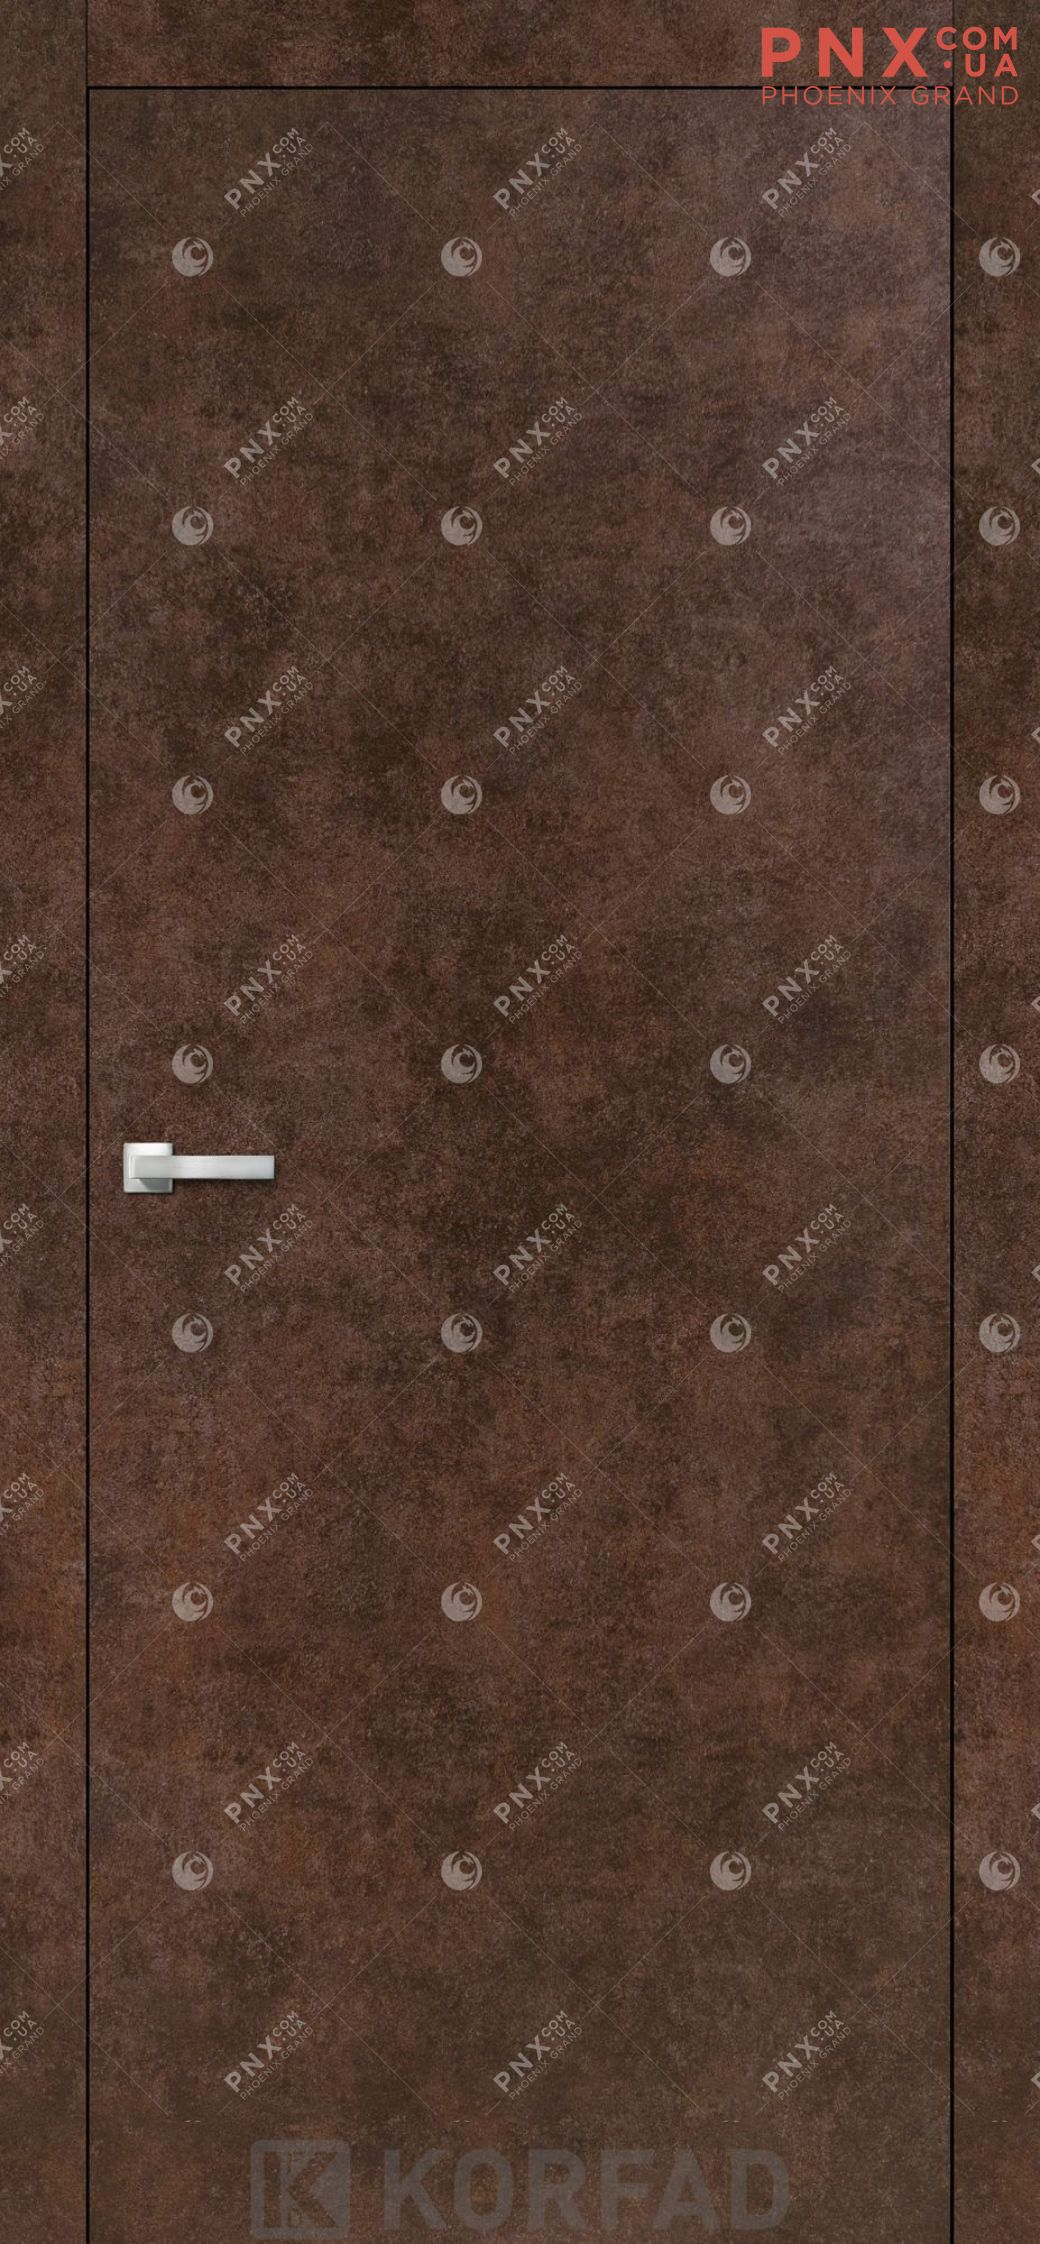 Міжкімнатні двері  Korfad LP-01 , арт бетон, глухі